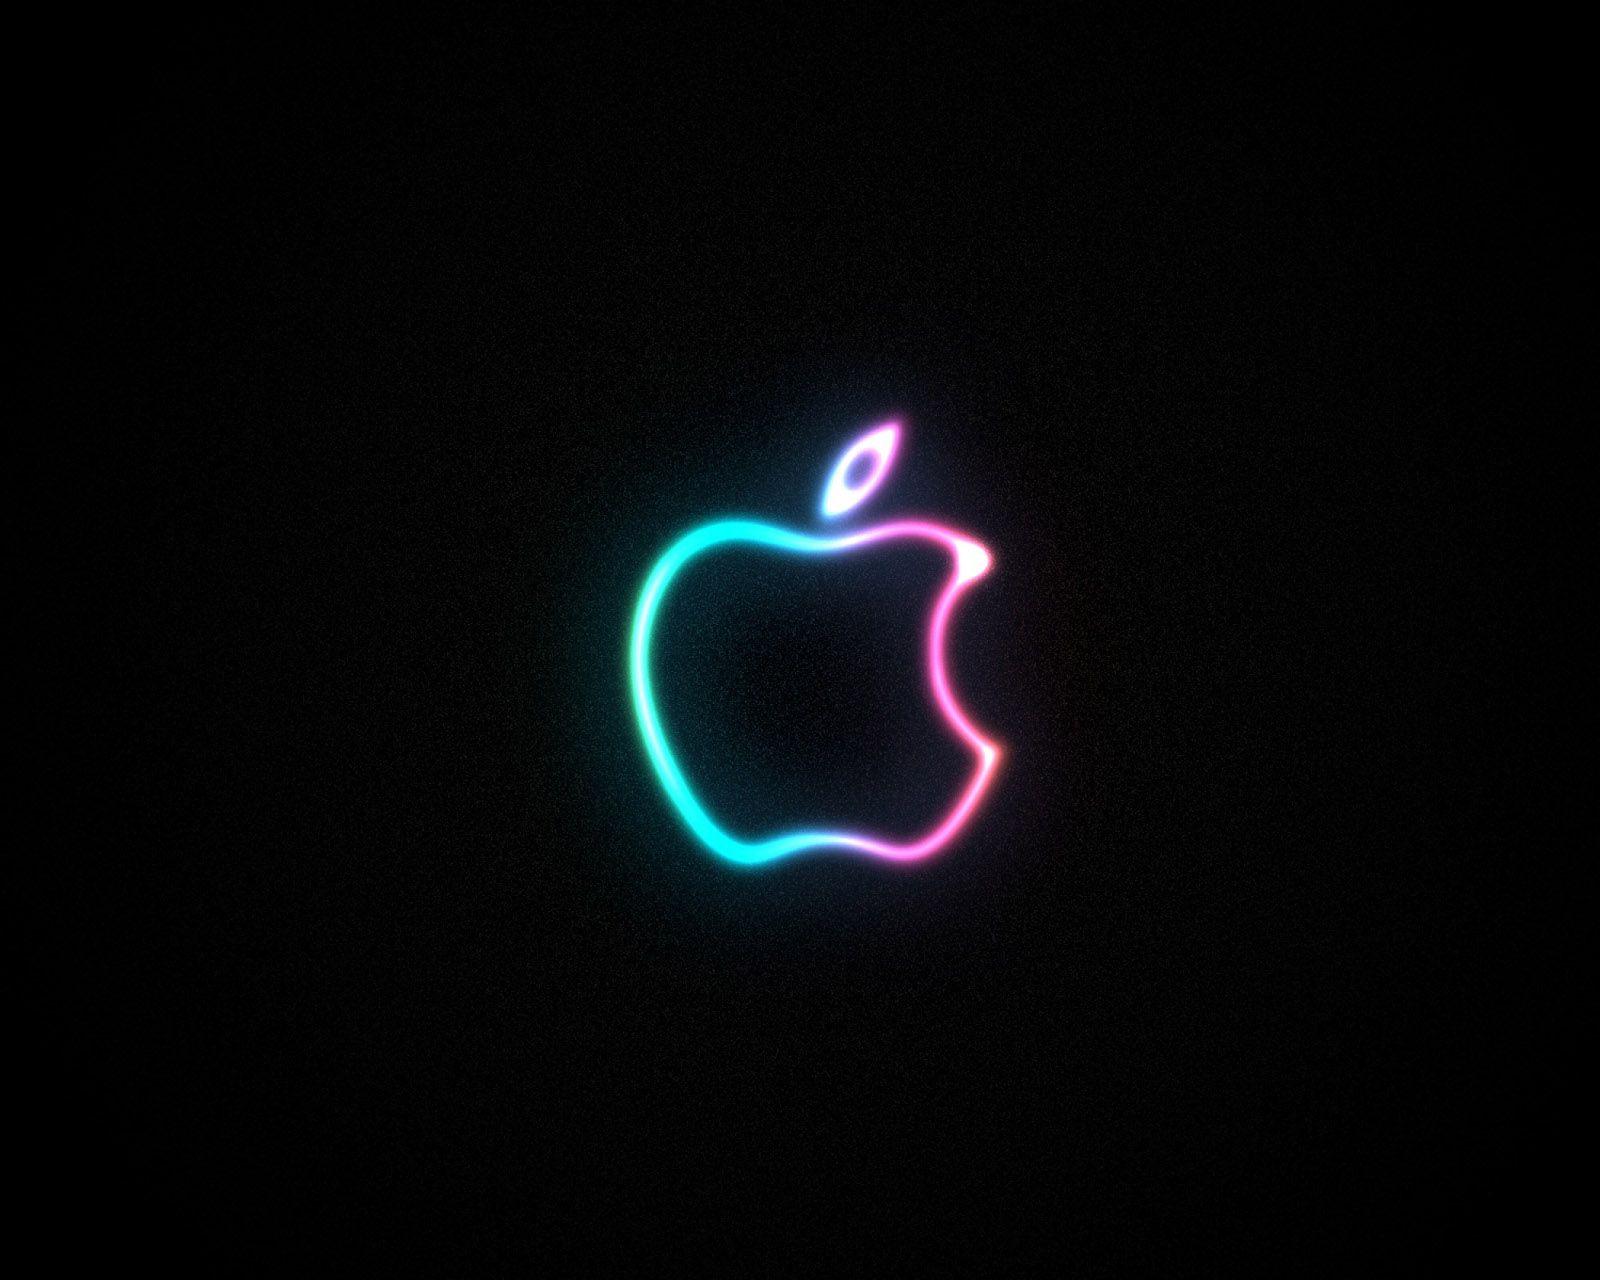 Apple Logo Wallpaper 15 Wallpaper Background Hd Logos